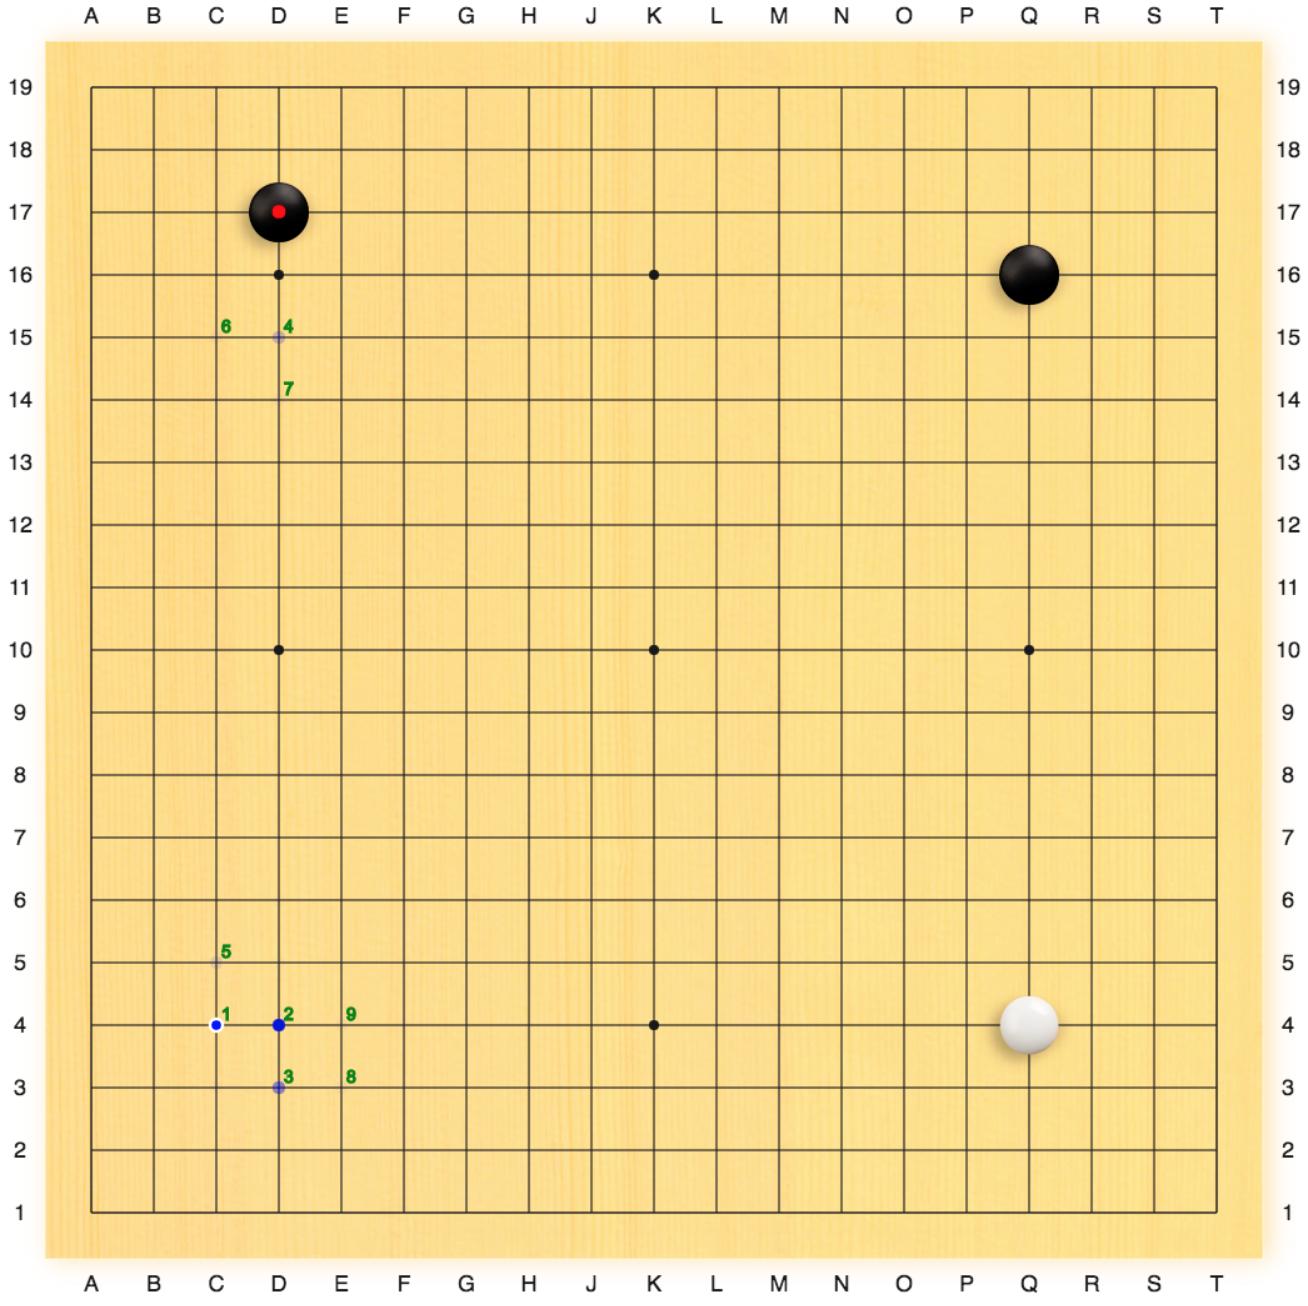 board_image